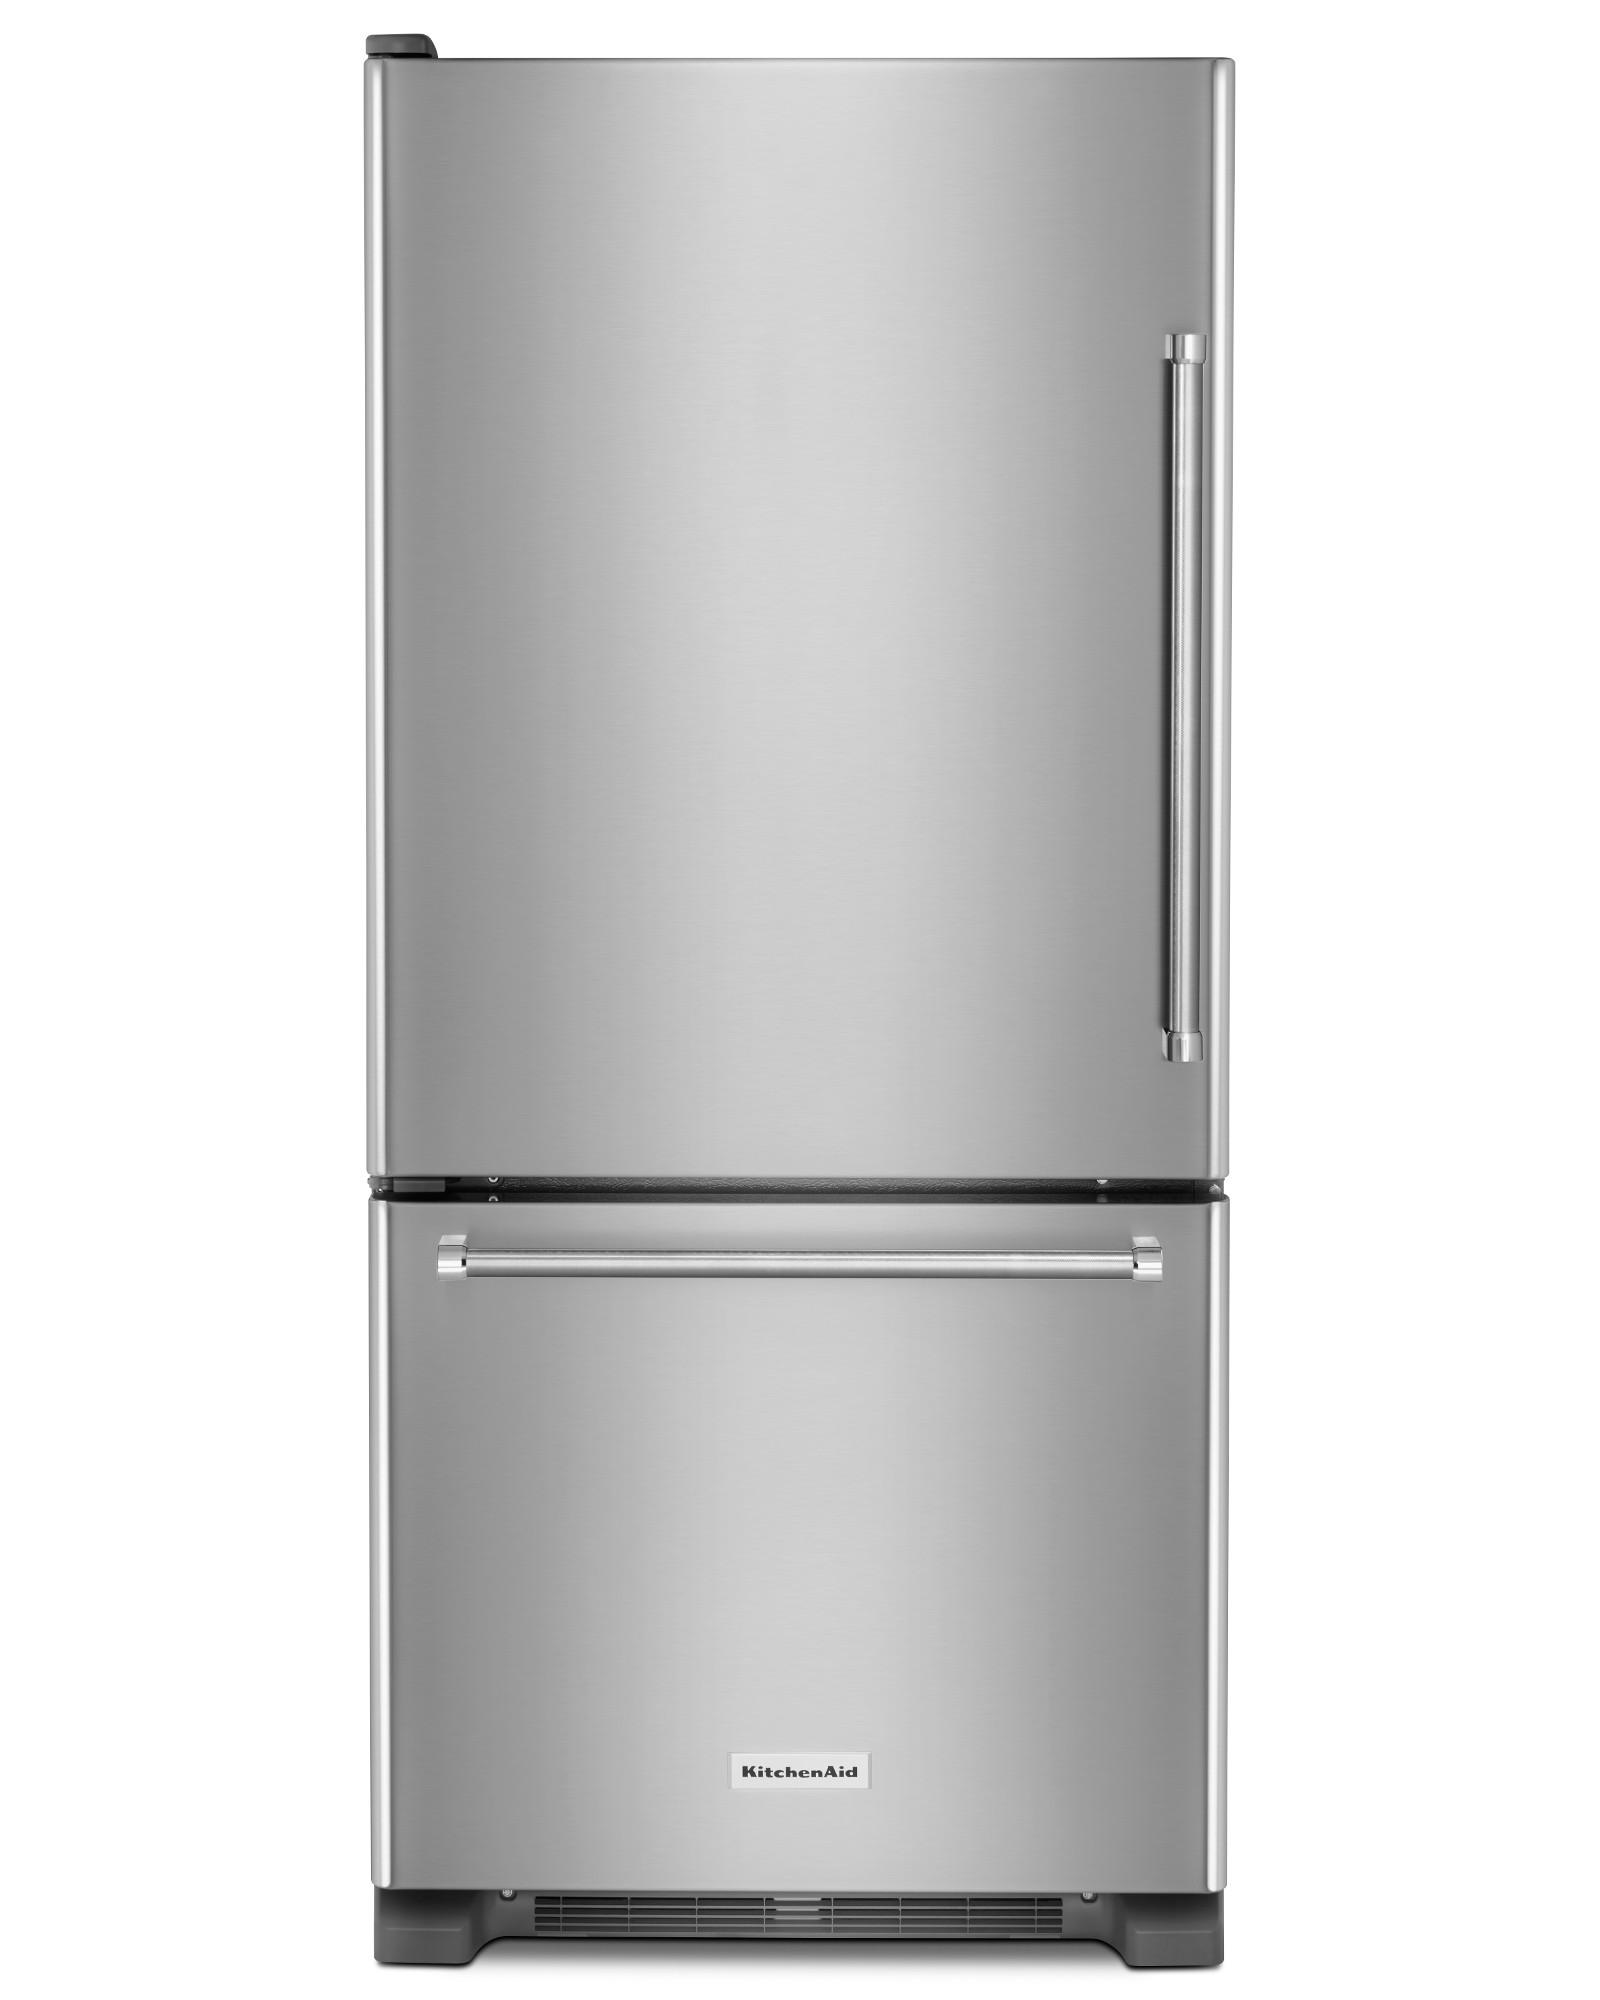 KitchenAid KRBL109ESS 19 cu ft Bottom Mount Refrigerator